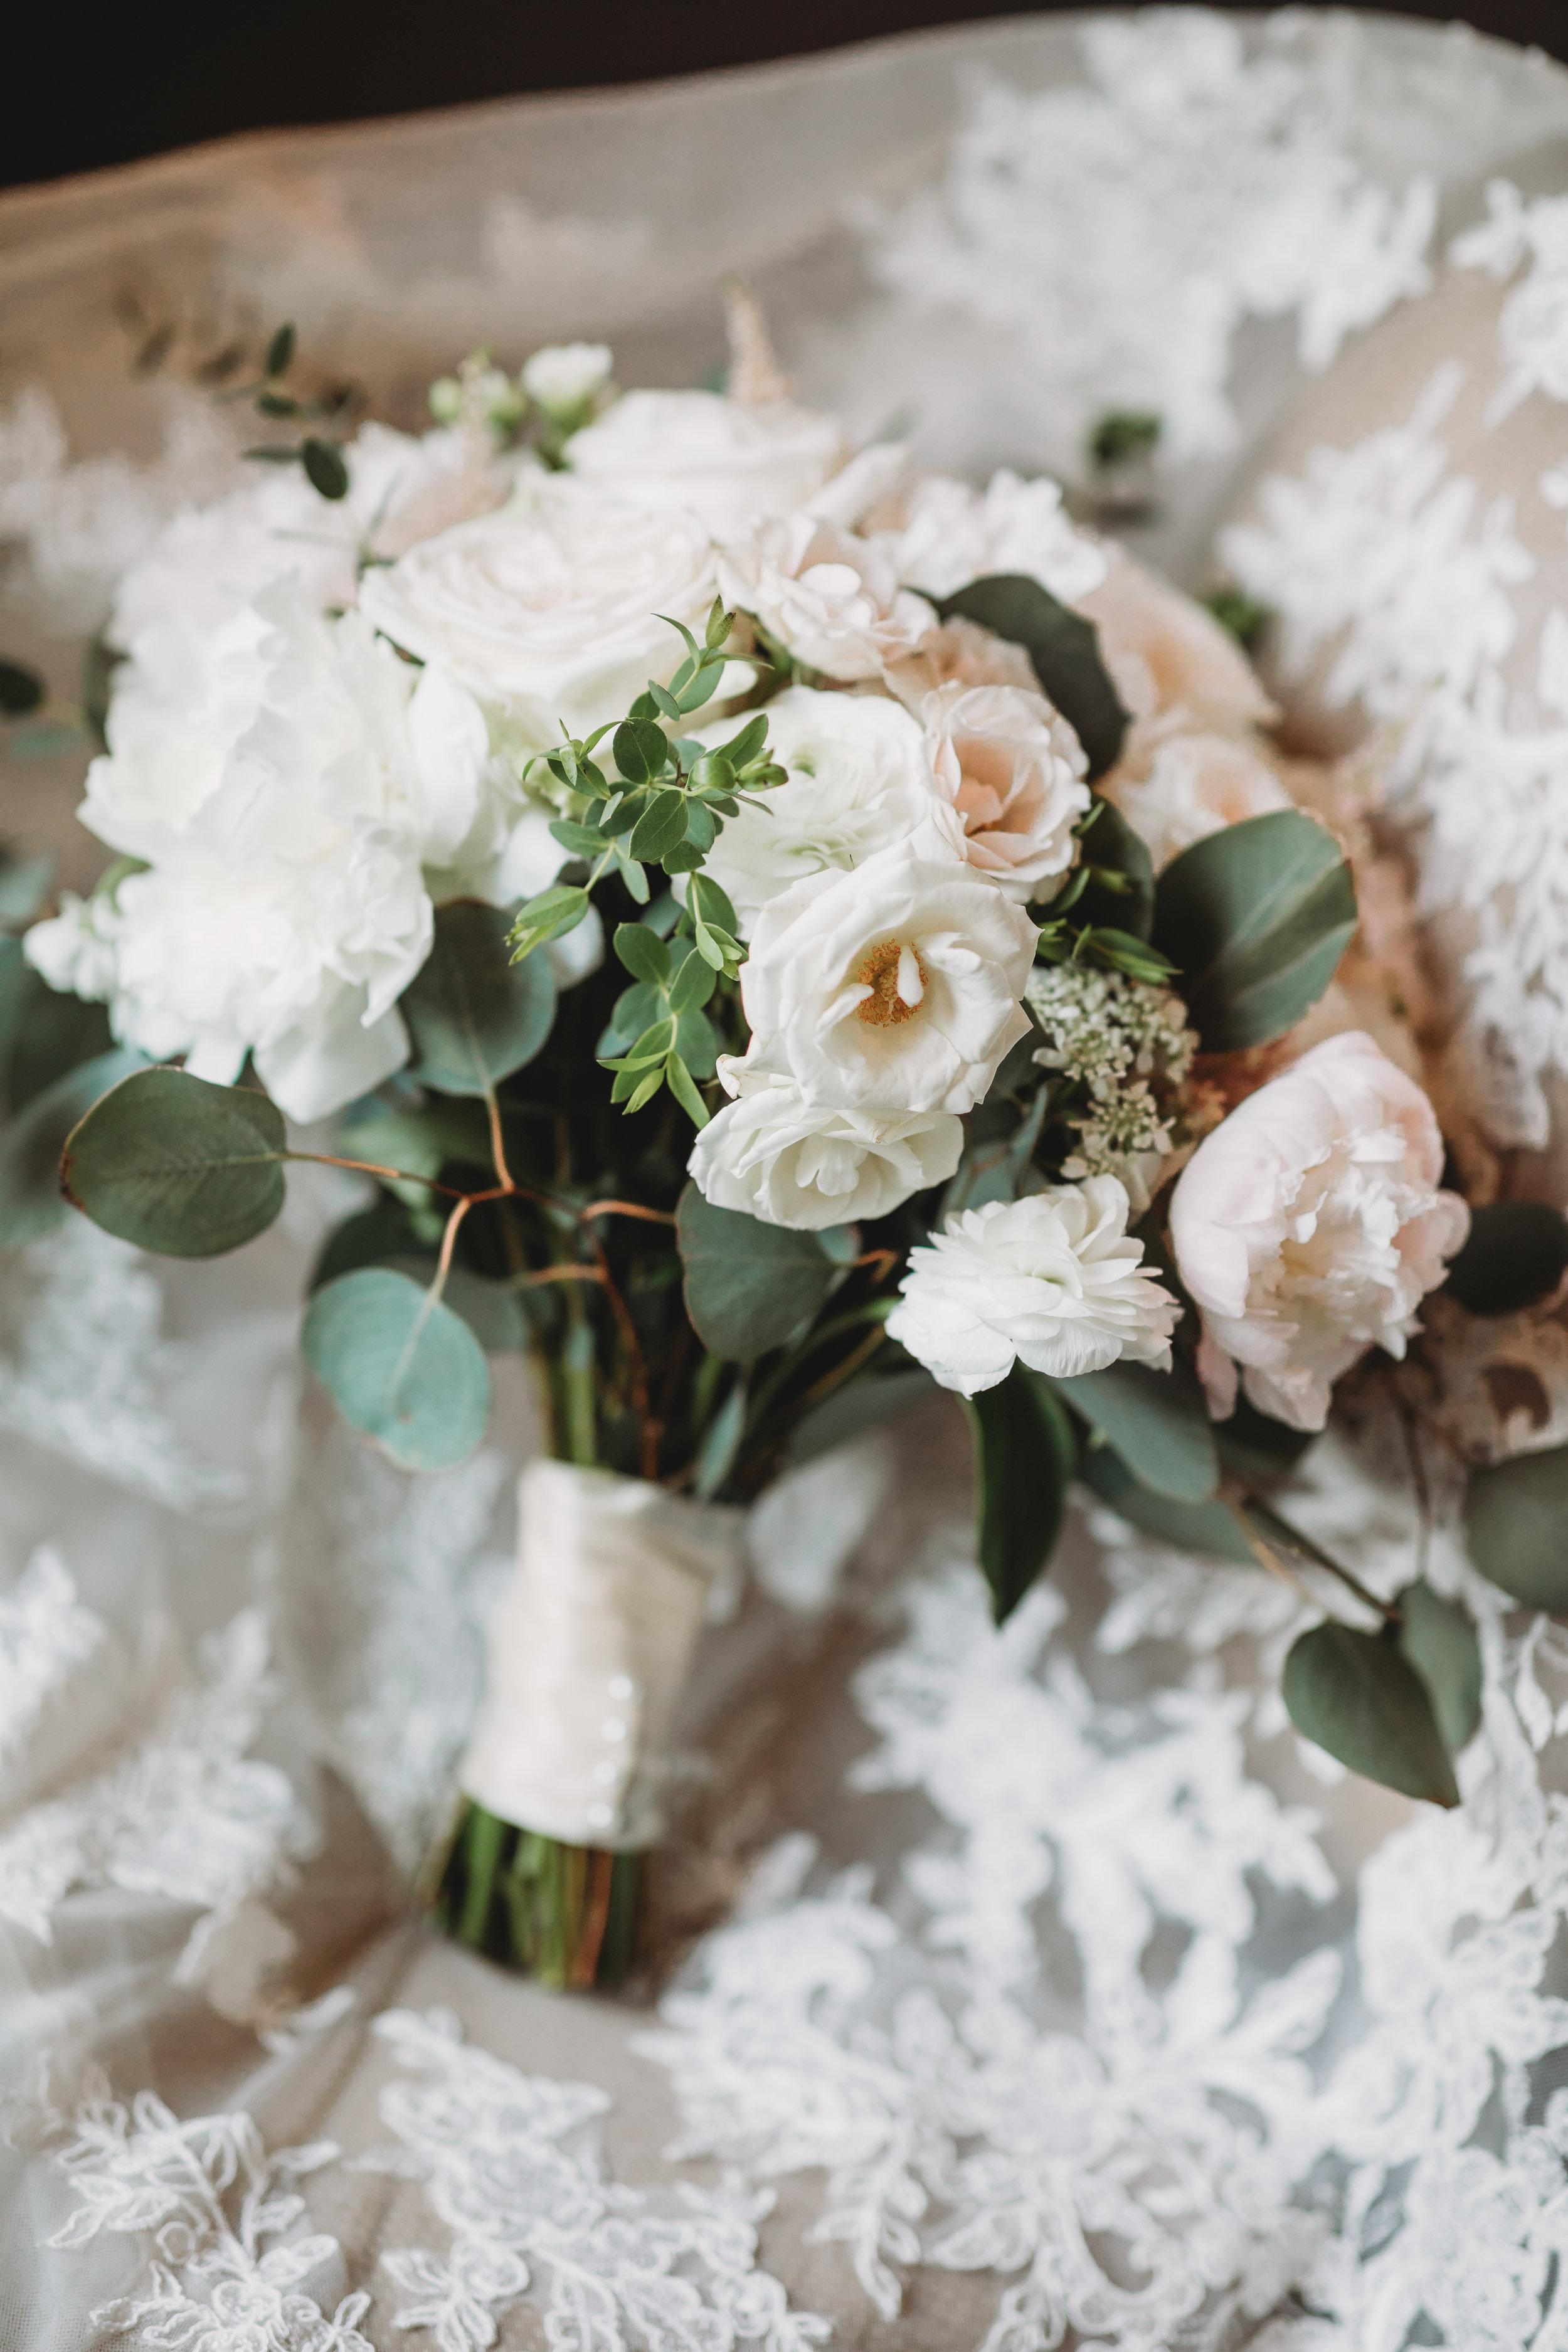 Summertime Elegance Sweet William Floral